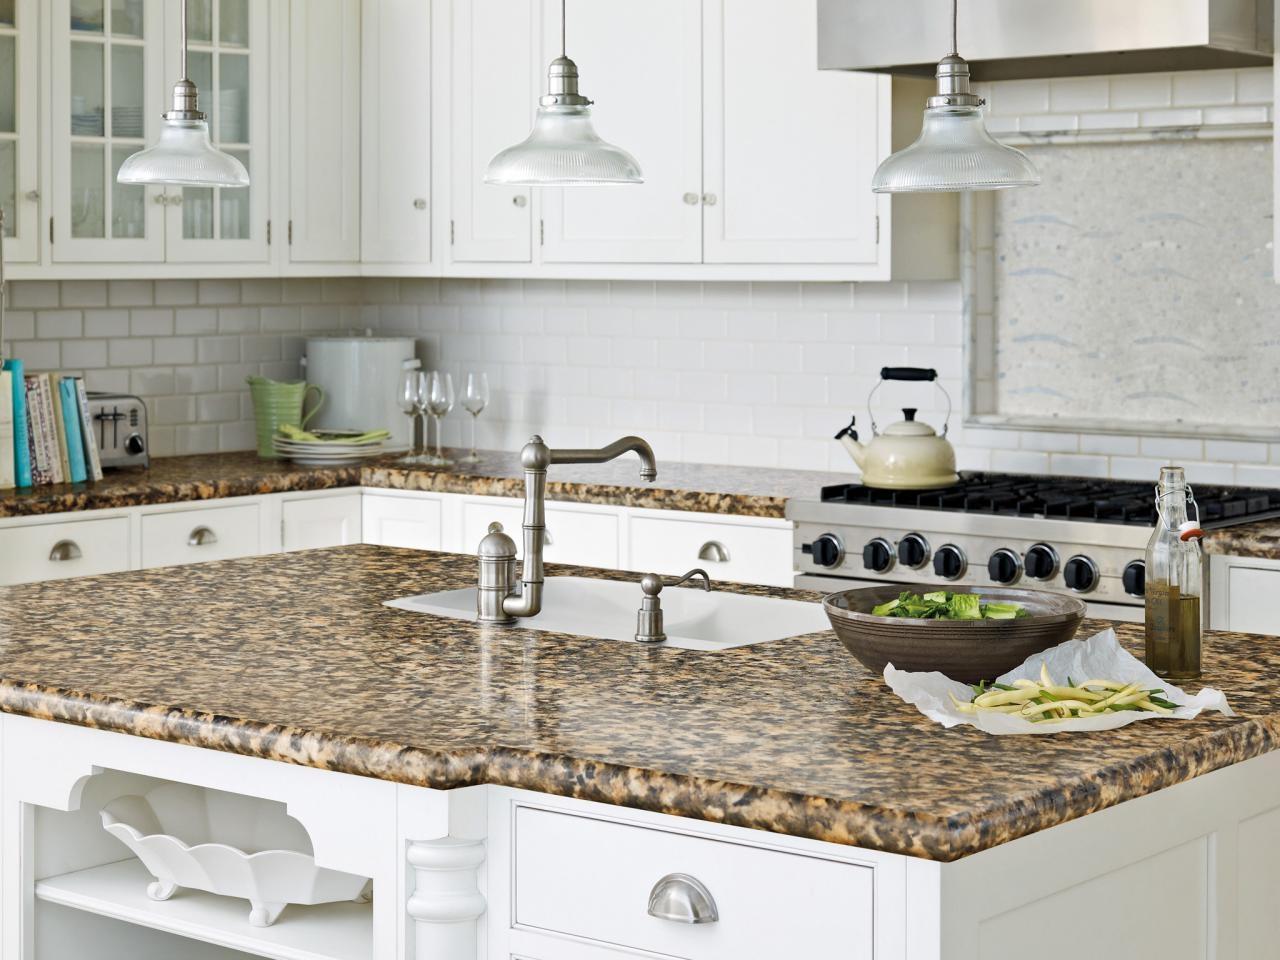 Ideas, rona kitchen sink luxury best american standard kitchen faucets throughout measurements 1280 x 960 jpeg.